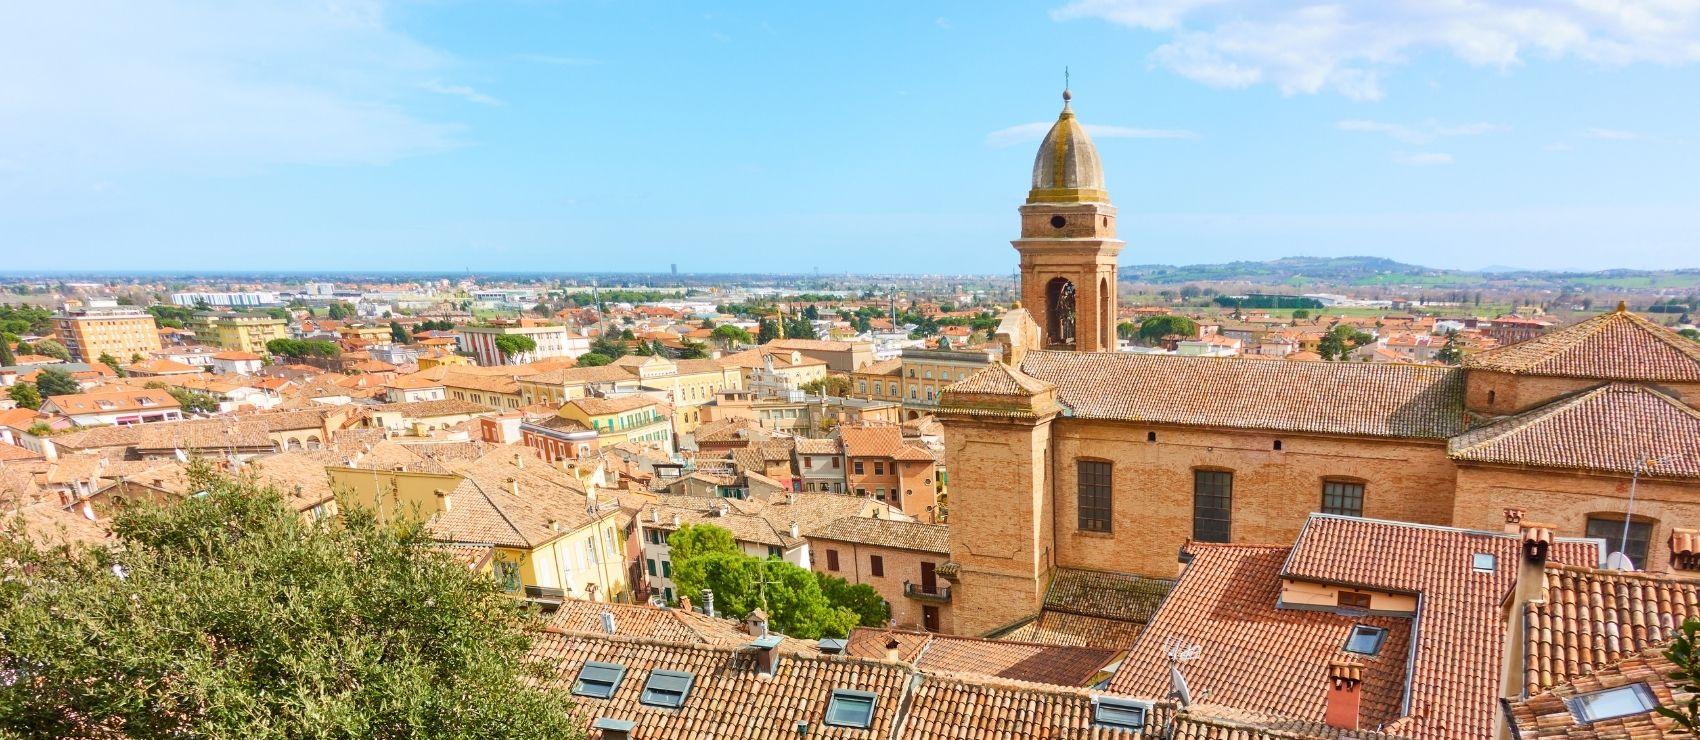 Rediscovering Valmarecchia